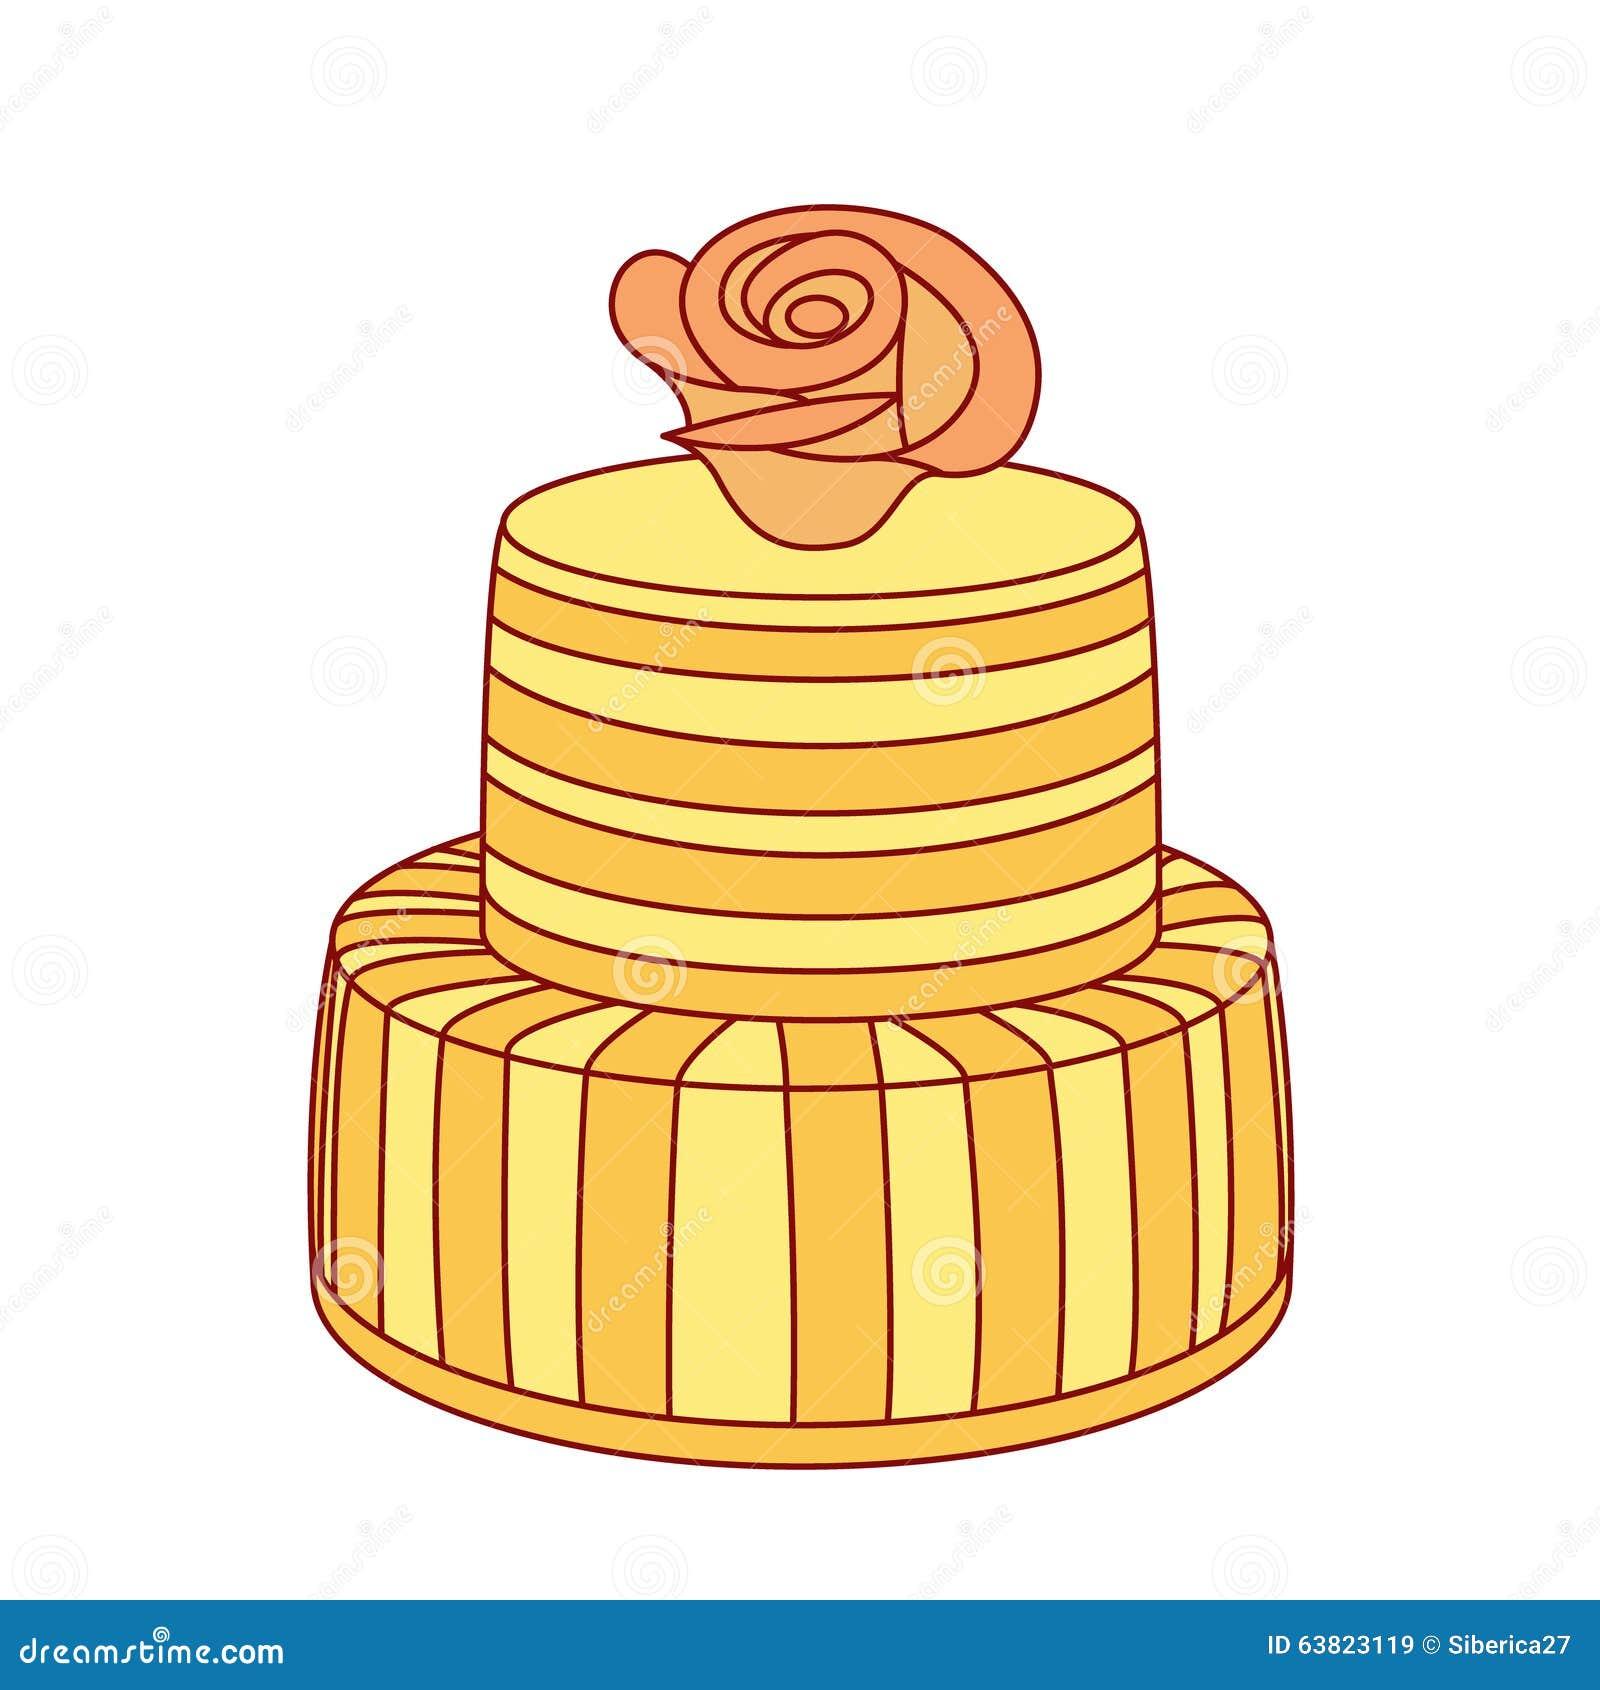 Wedding cake illustration. stock vector. Illustration of bakery ...